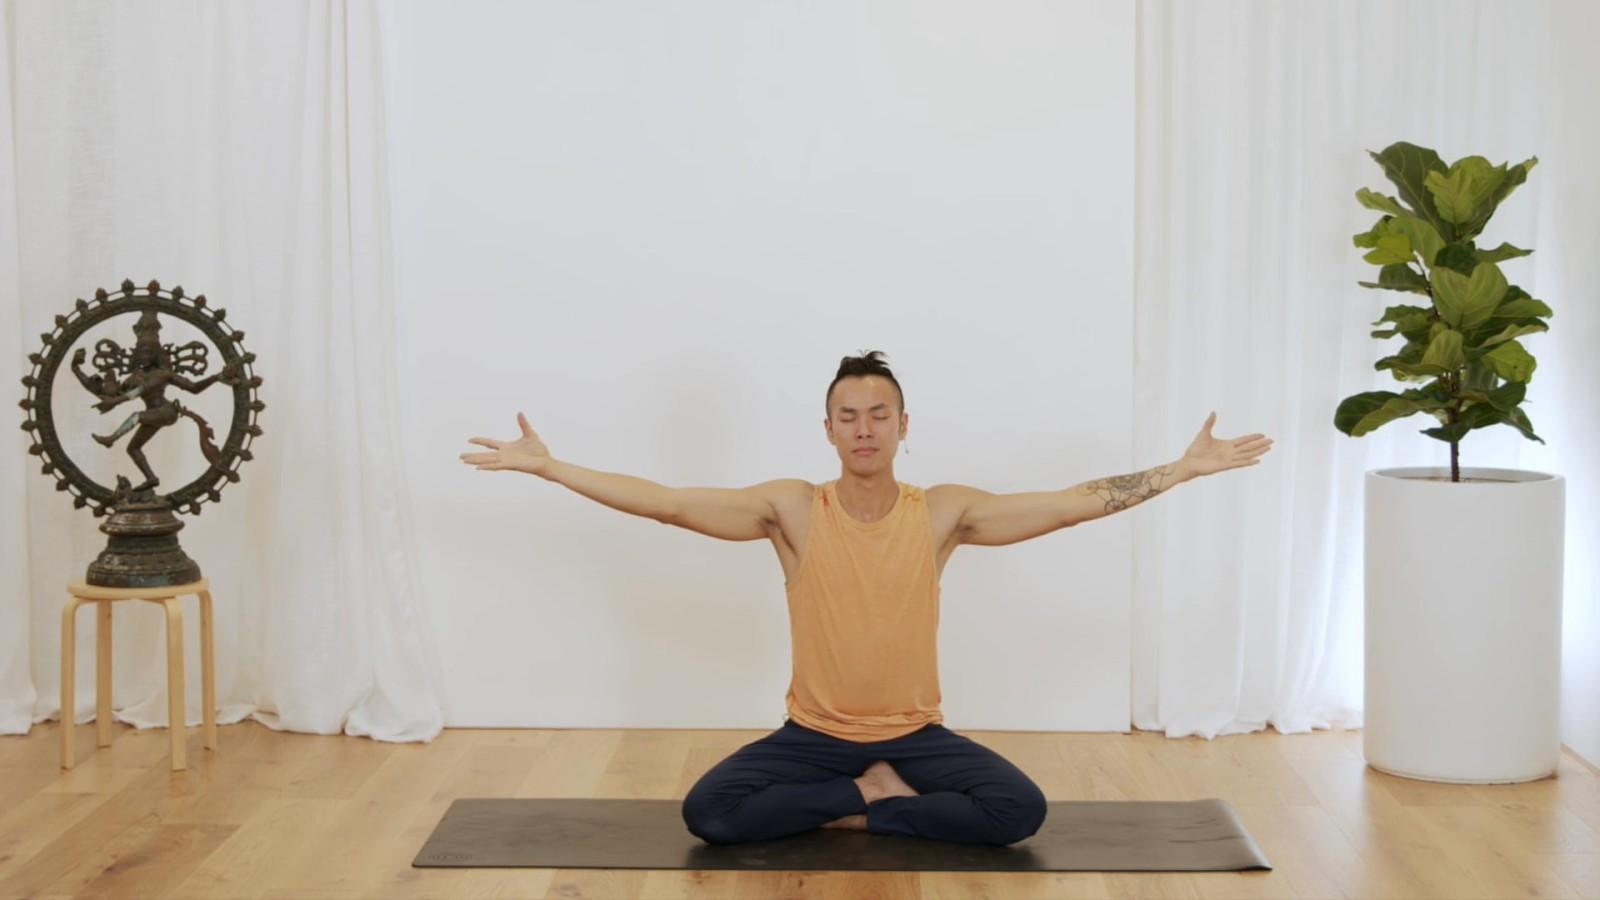 Kundalini Breathwork for Removing Negative Blocks with Johnson Chong